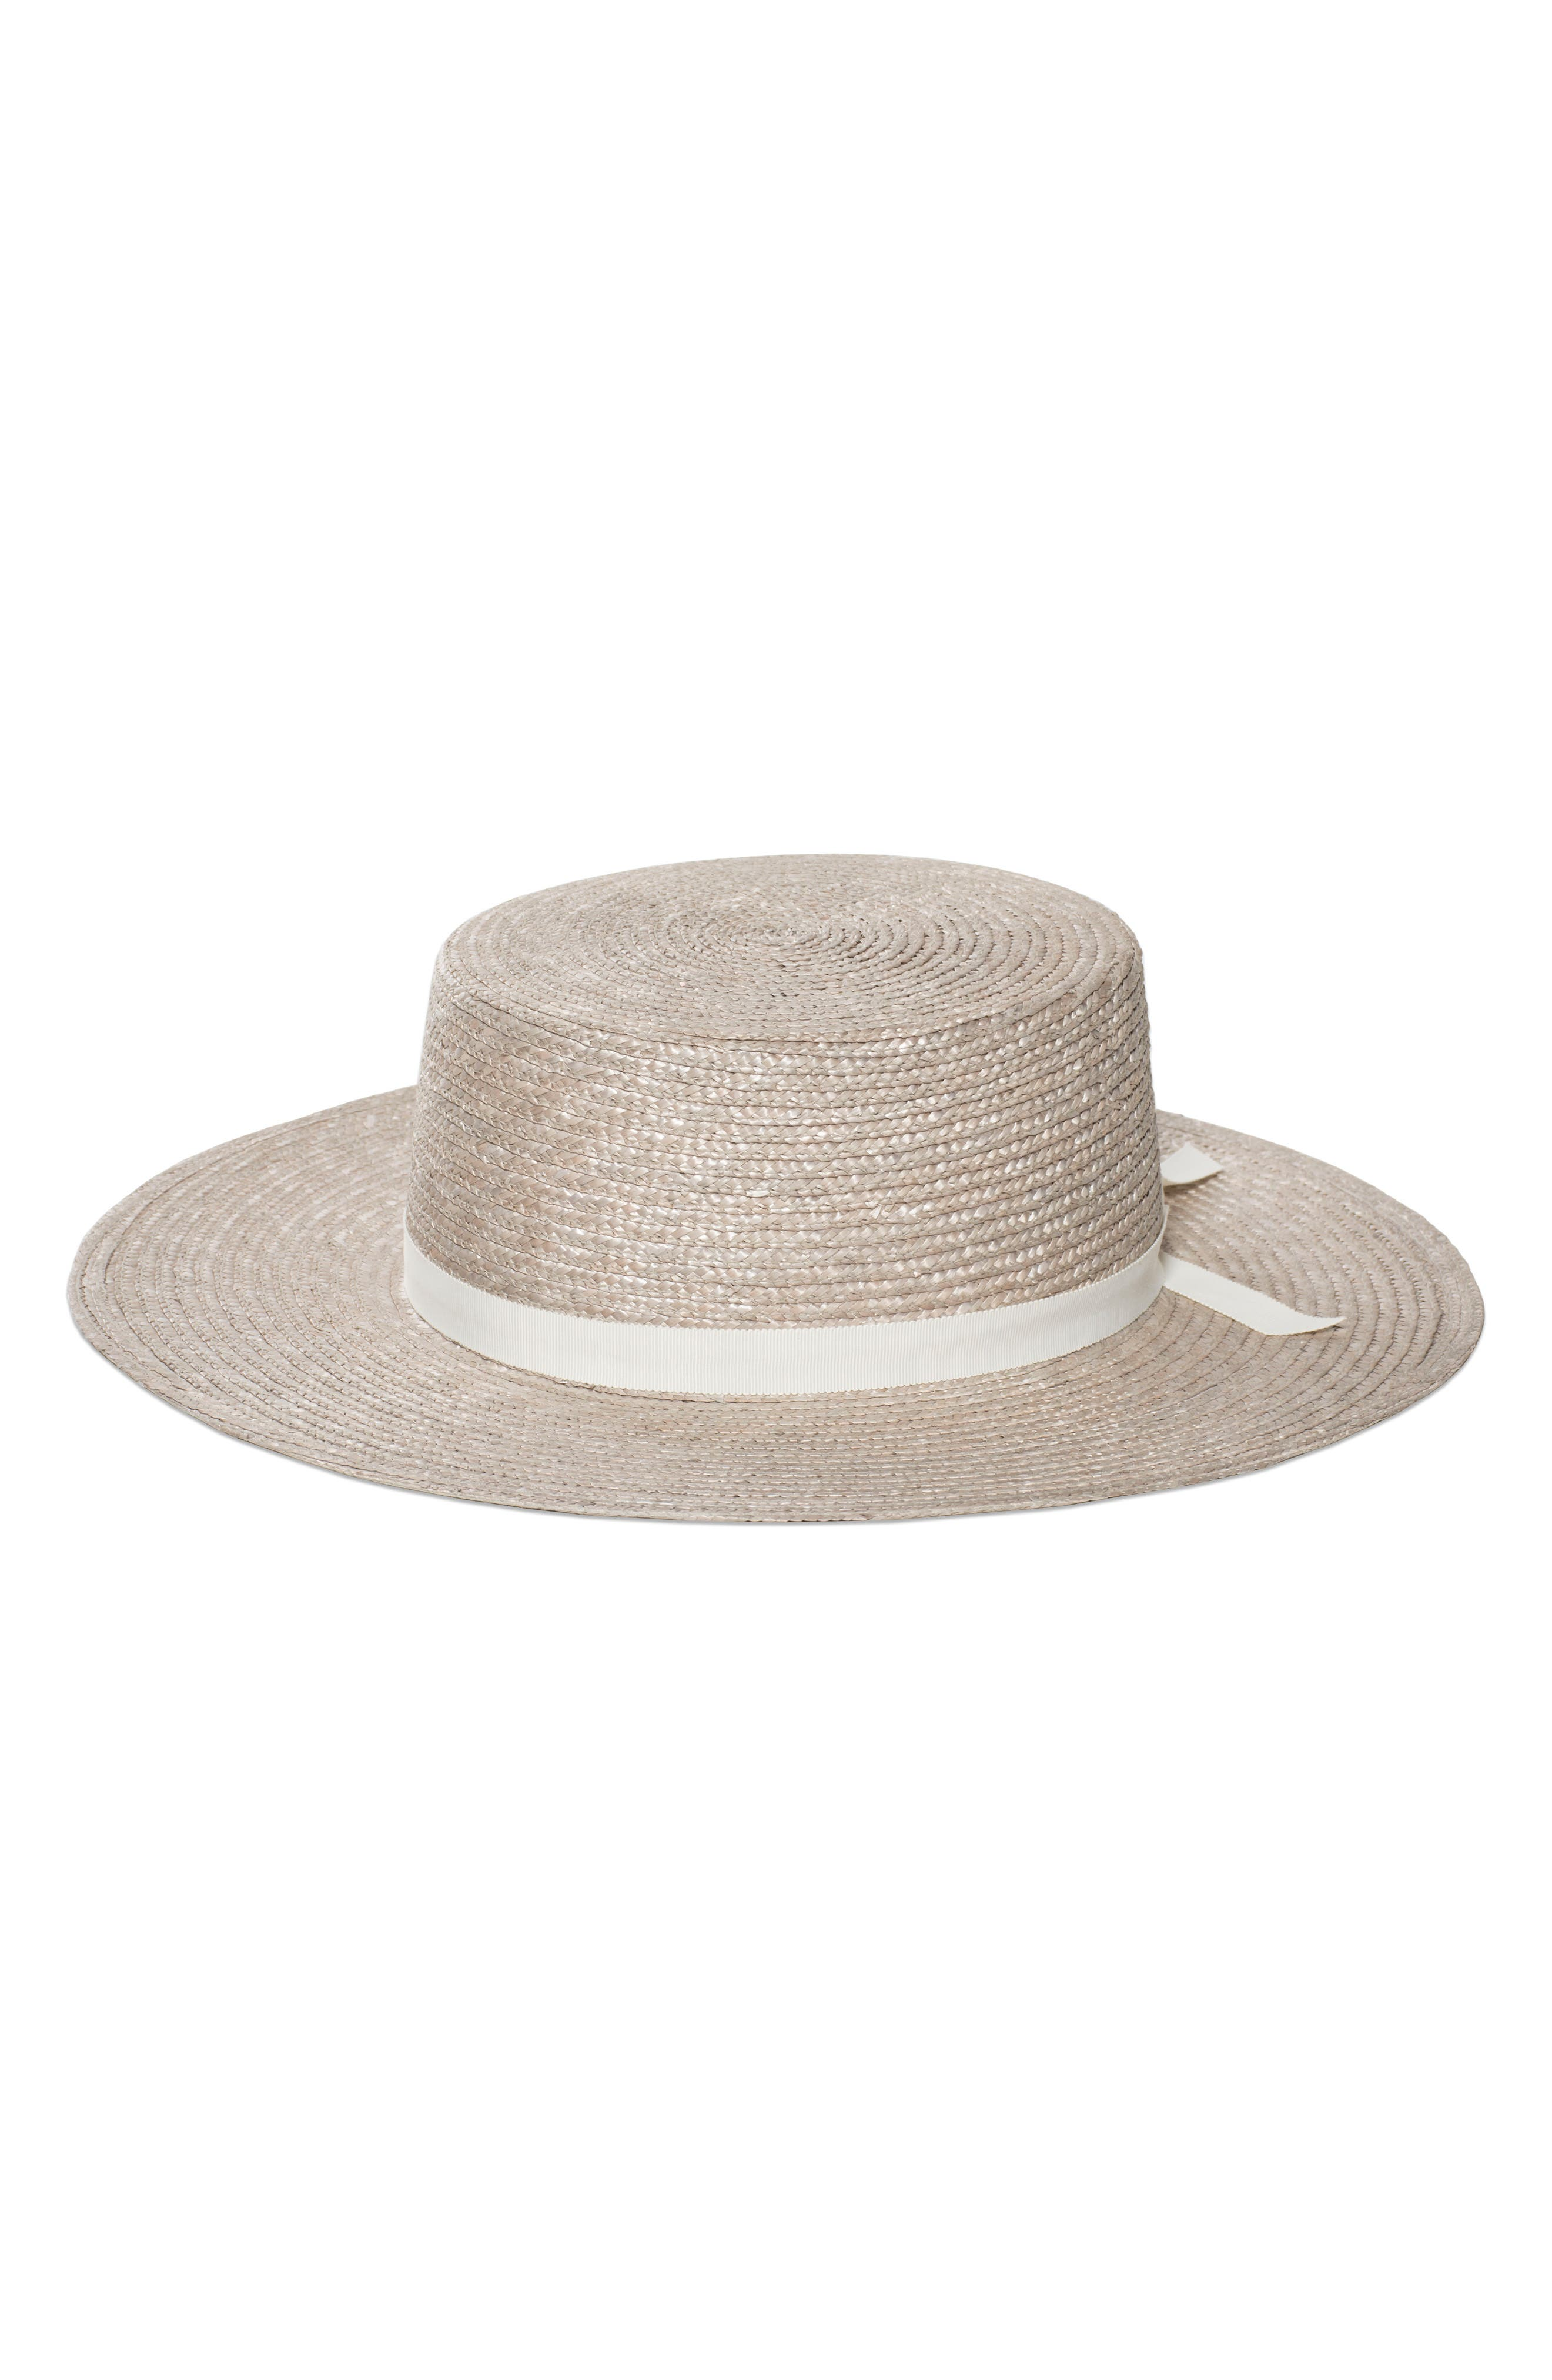 Bijou Van Ness The Highland Straw Boater Hat